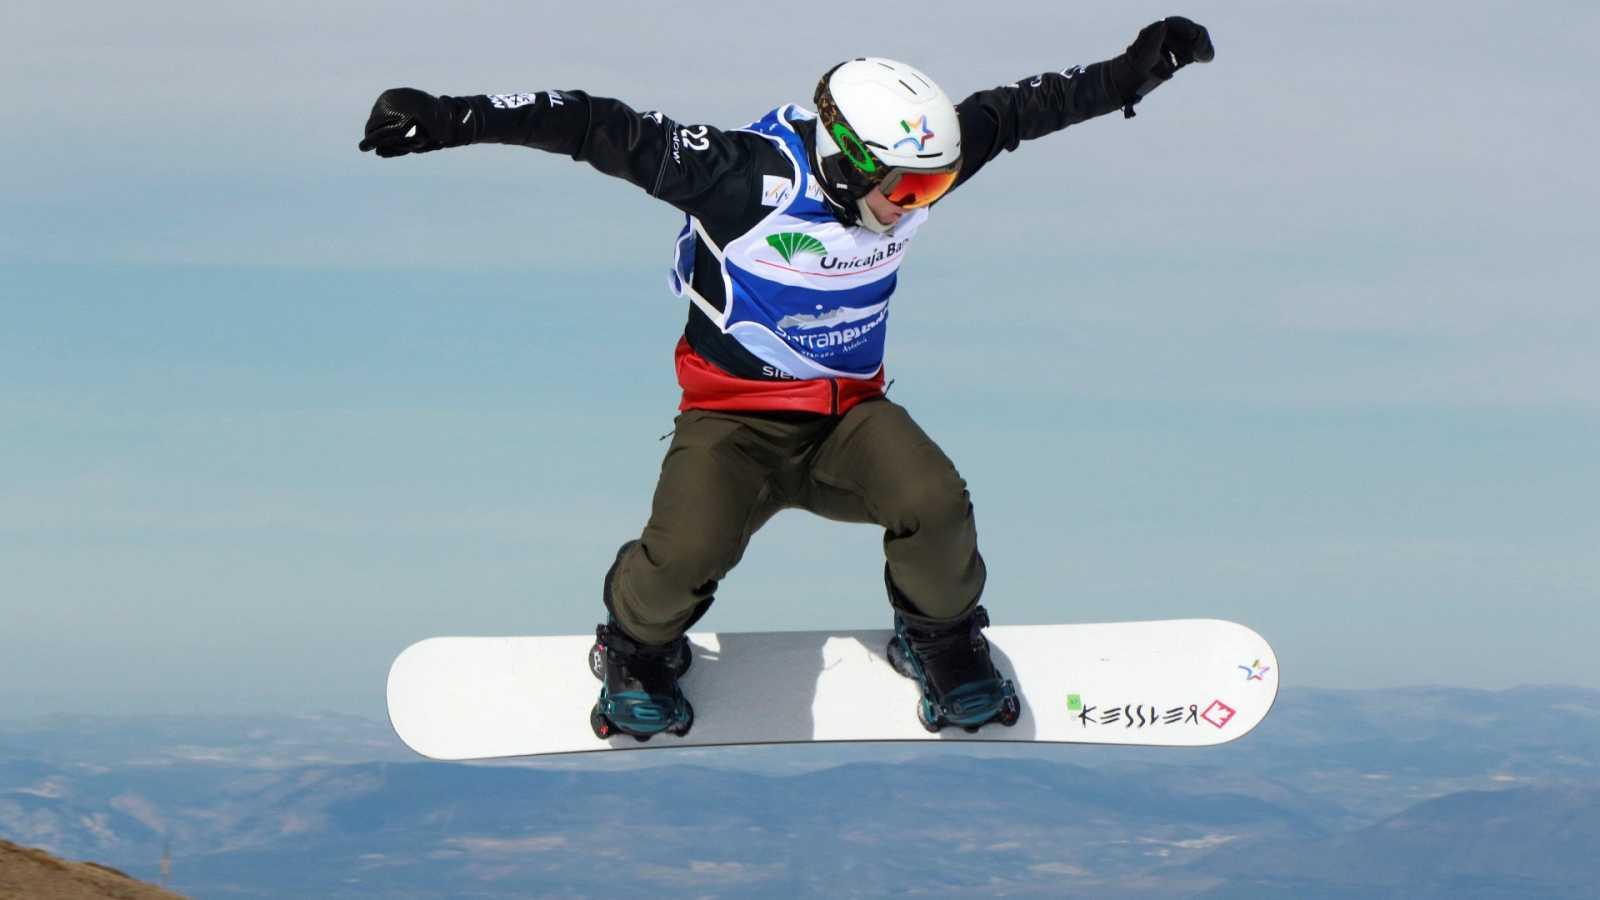 Snowboard - FIS Snowboard Copa del Mundo Magazine - Programa 12 - ver ahora